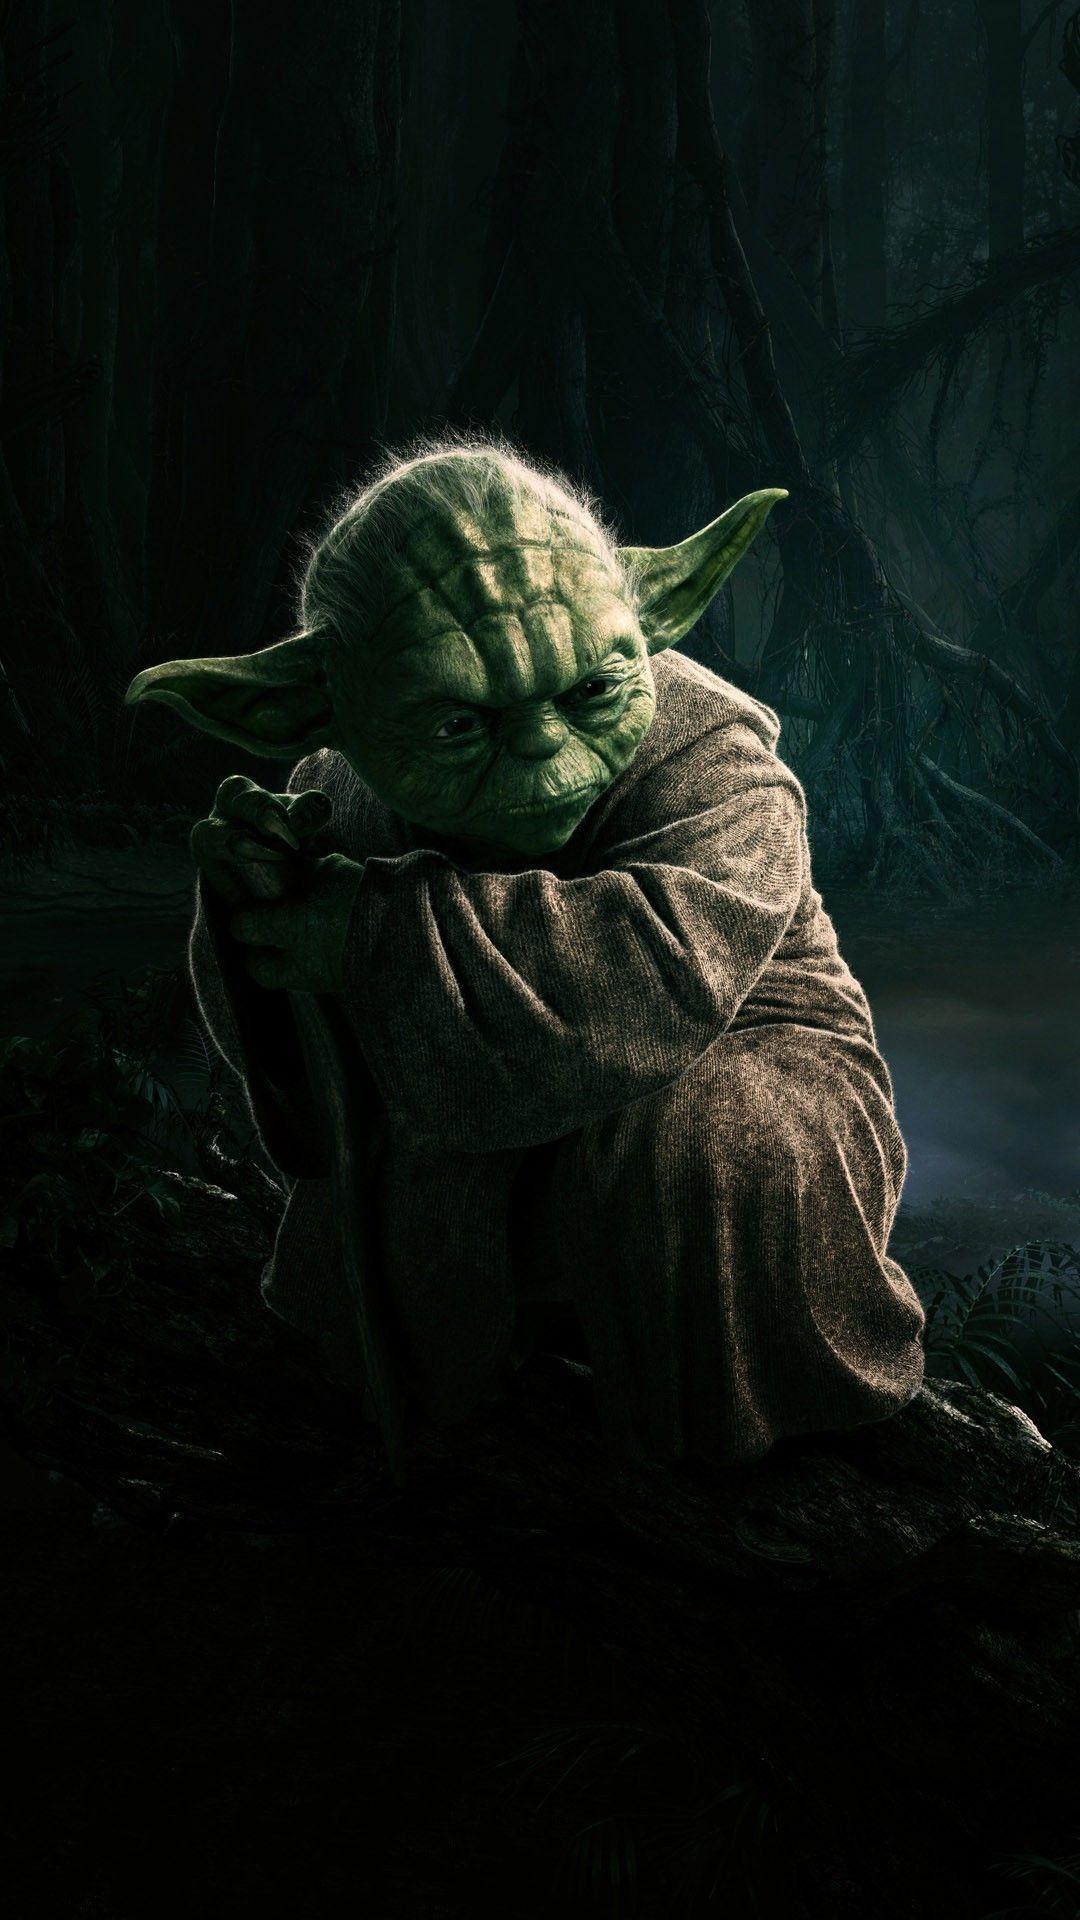 Star Wars Yoda Art Image By Jason Wolf On Star Wars Star Wars